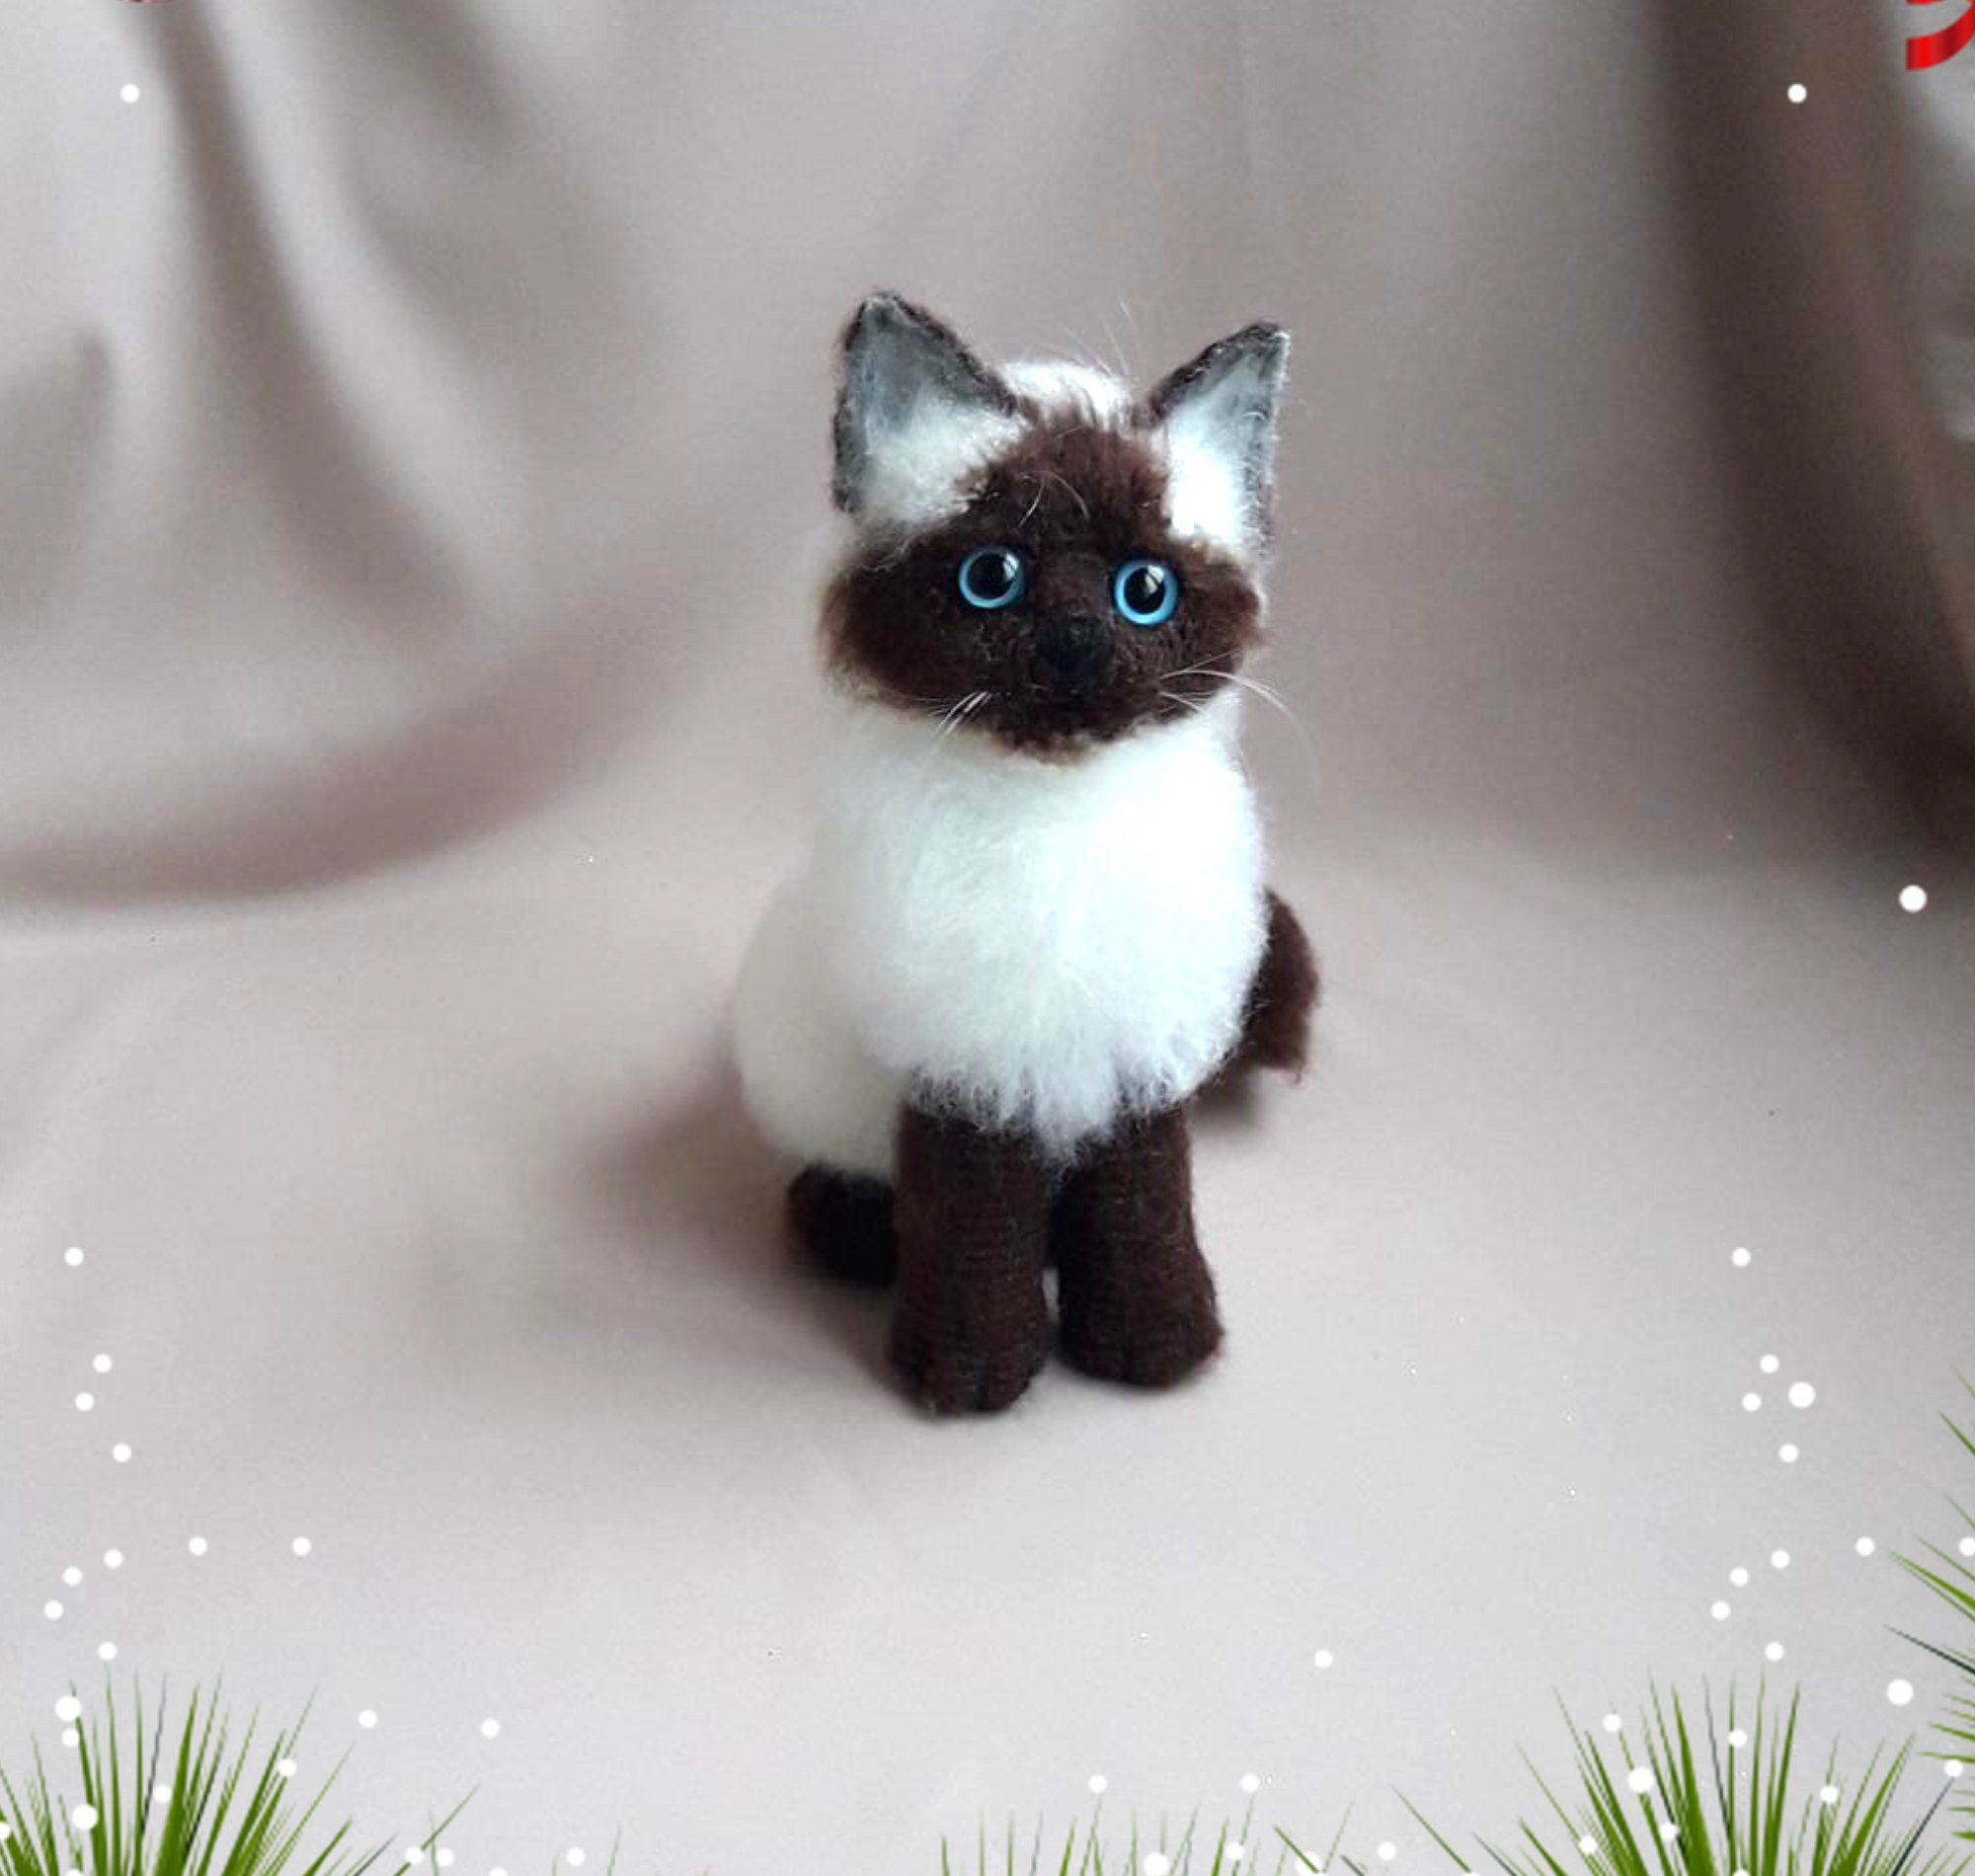 siamese cat crochet toy White fluffy cat cute fluffy kittens plush cat realistic cat Miniature cats